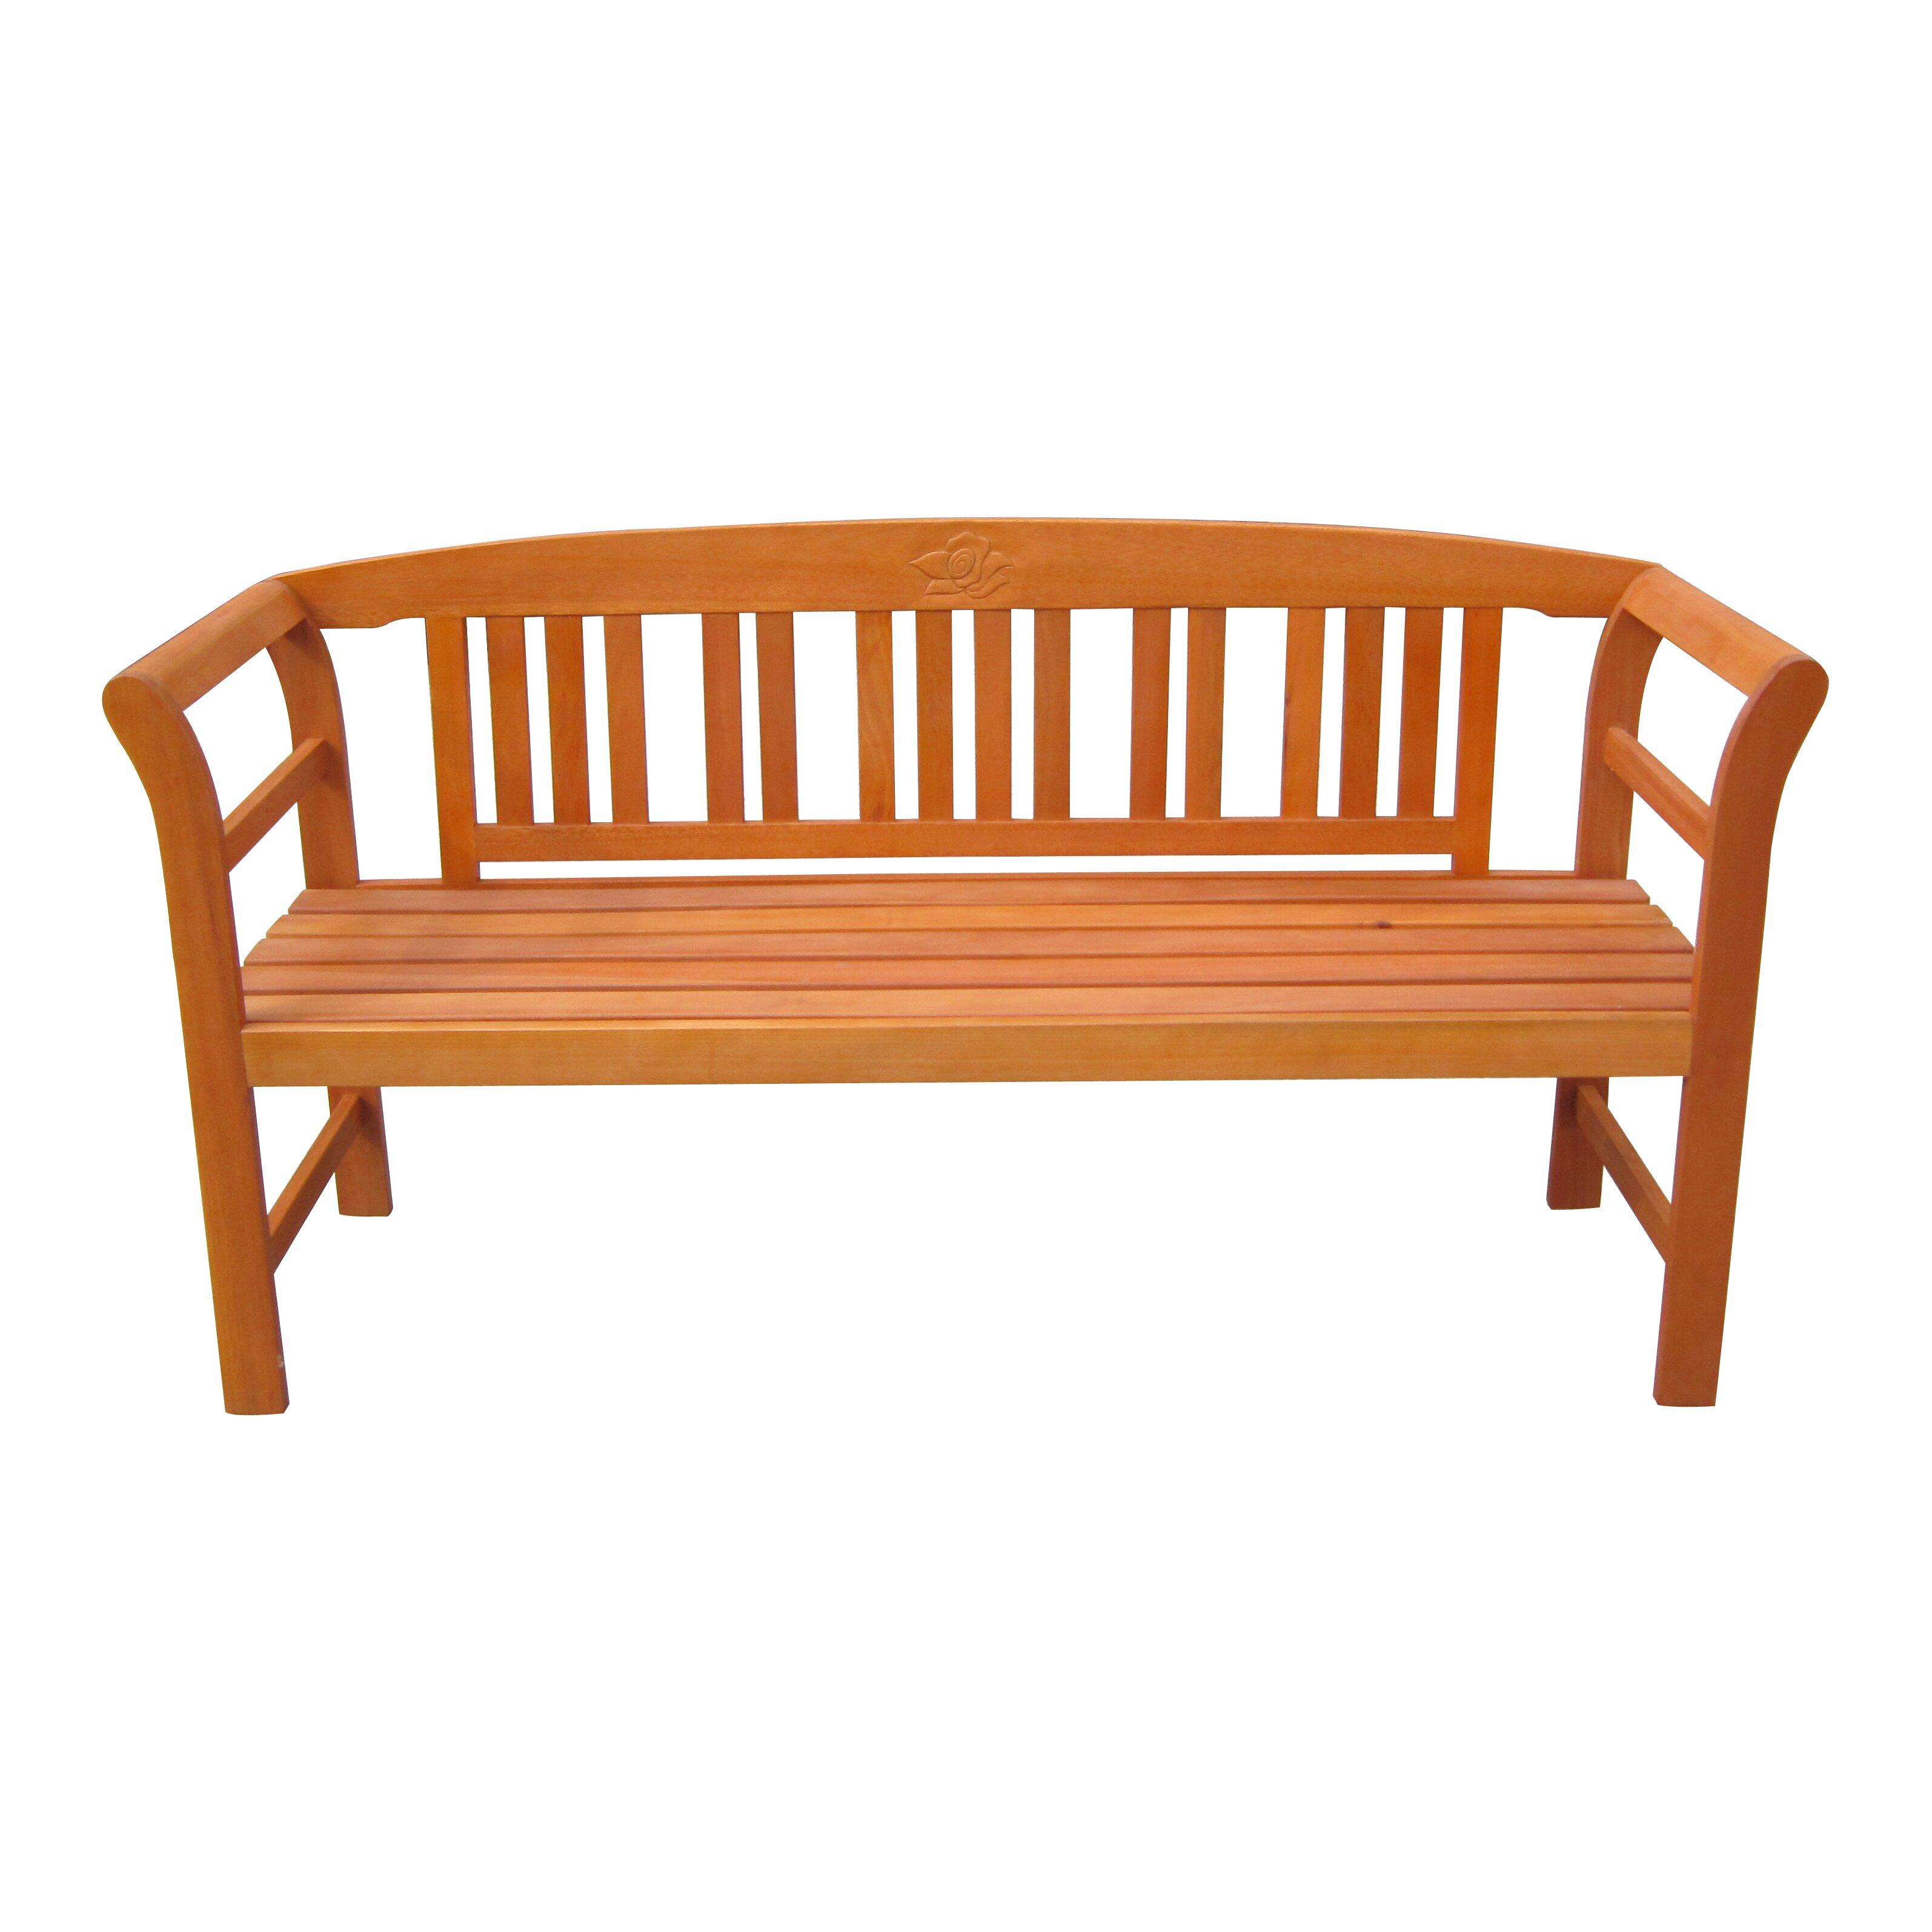 garten living 3 sitzer gartenbank harland aus eukalyptus grandis fsc bewertungen. Black Bedroom Furniture Sets. Home Design Ideas